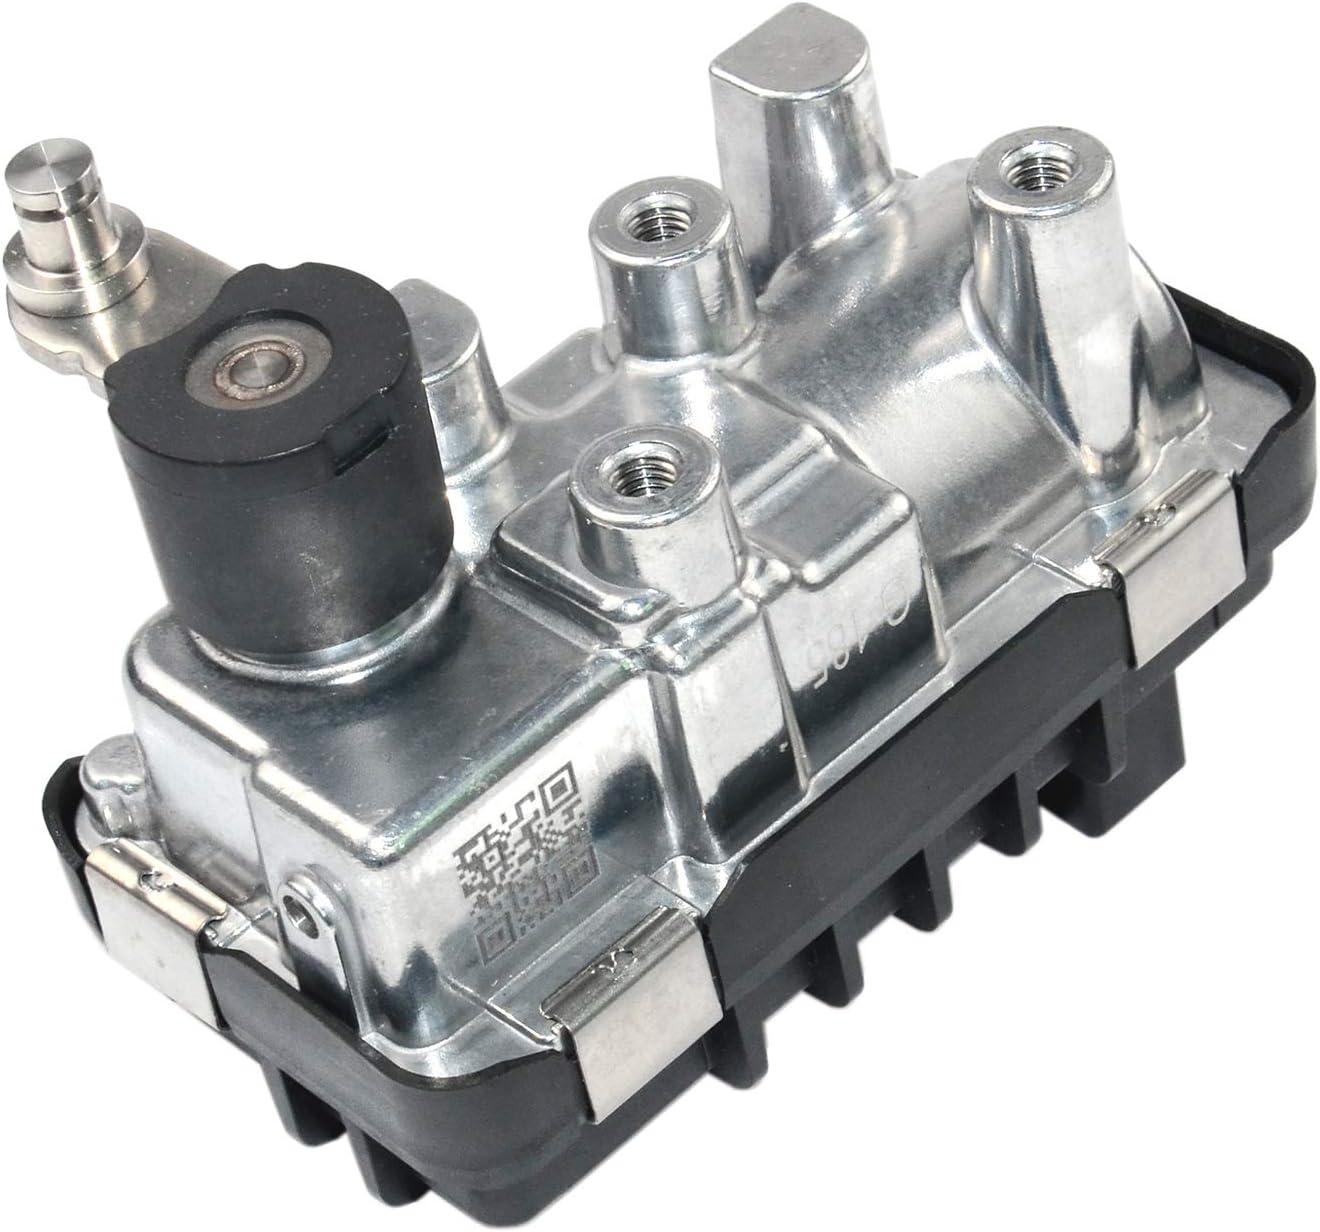 SCSN G-185 727461 742693 Commande turbo